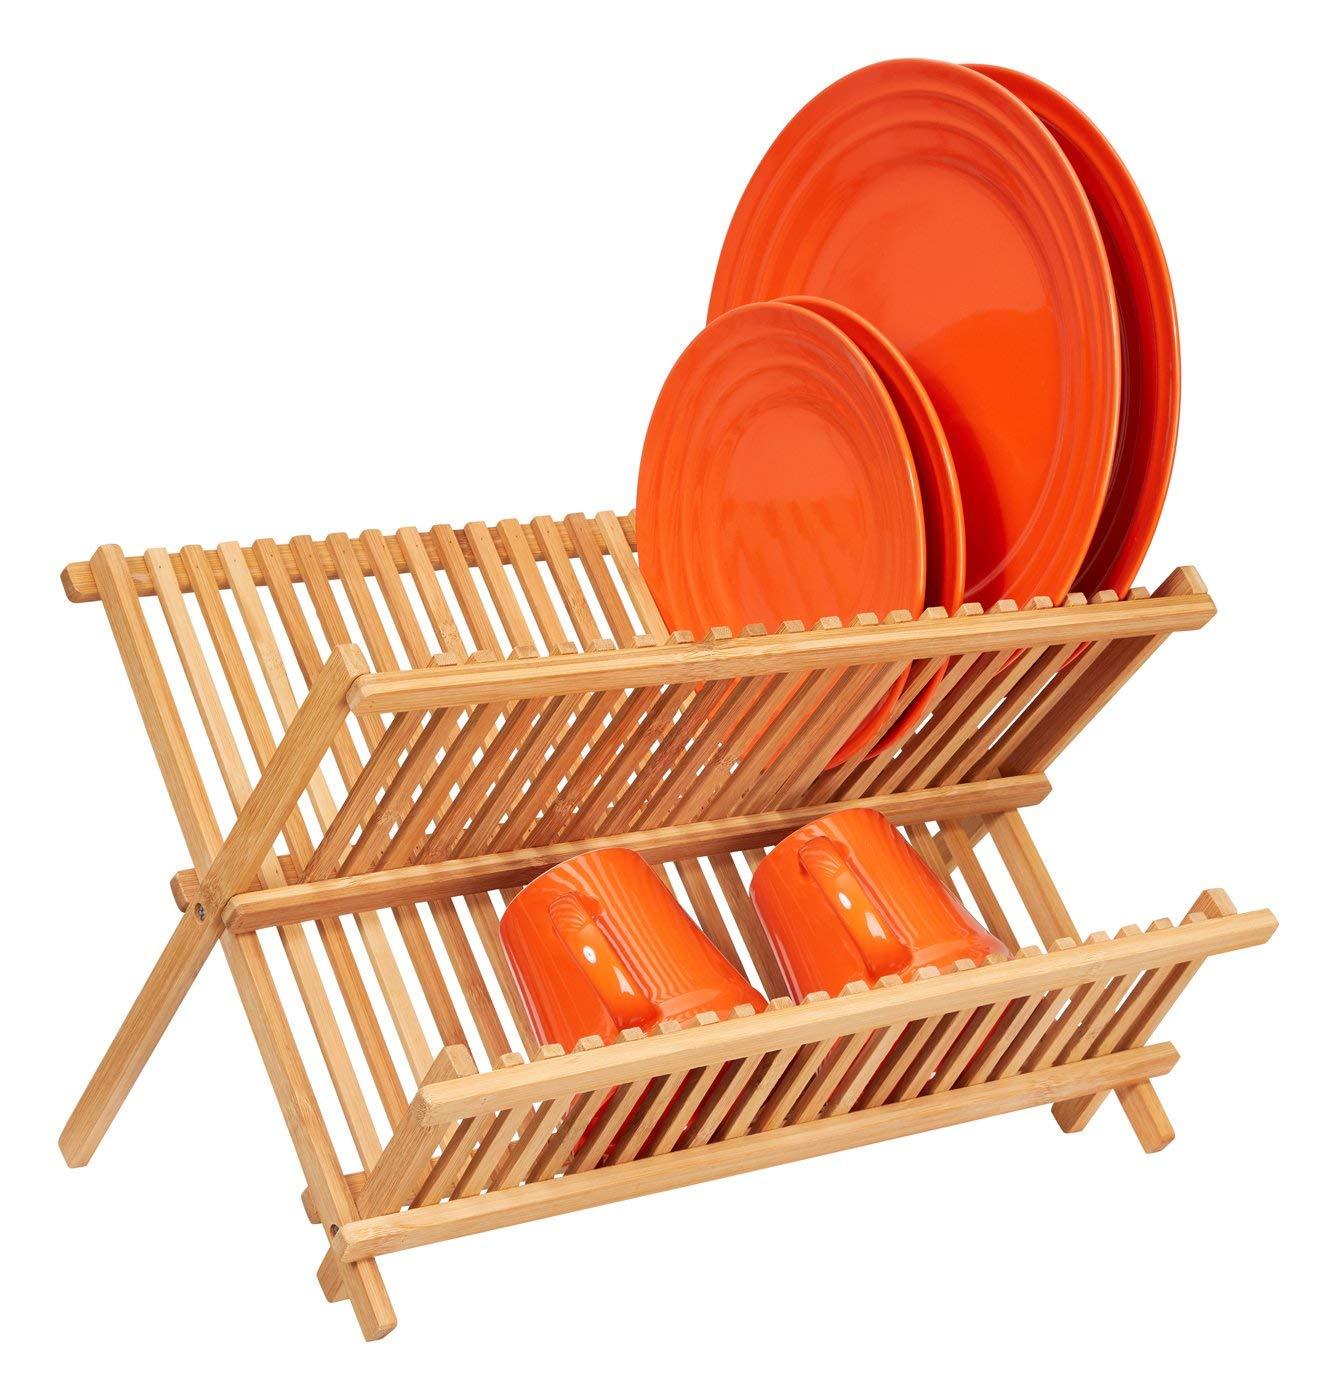 dish rack 105.jpg